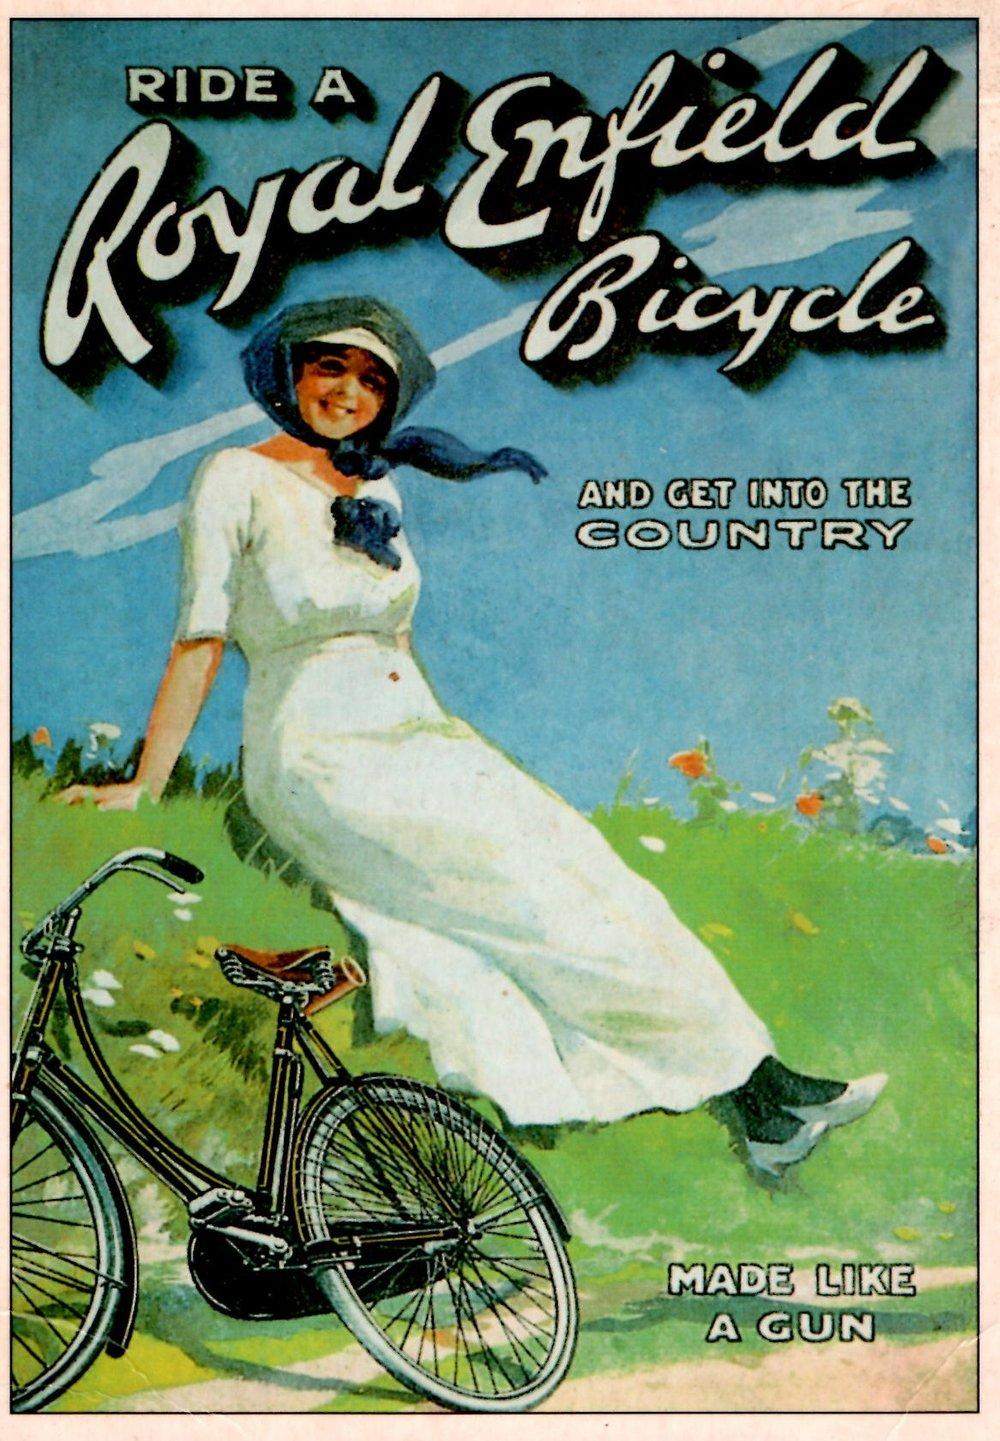 Best of Boneshaker Vintage Poster 3.jpg